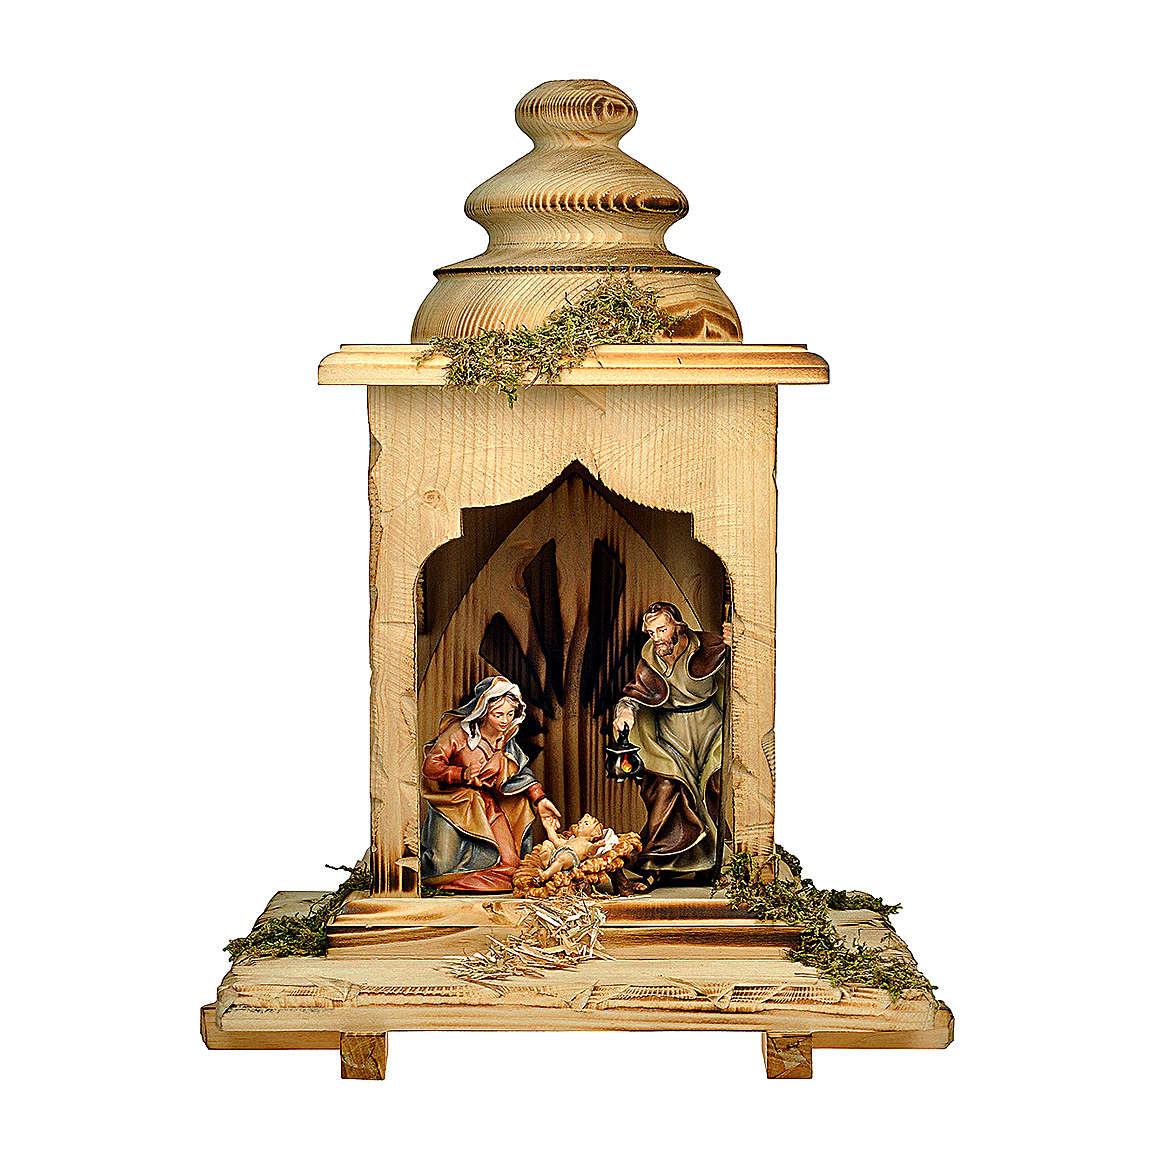 Sacra famiglia nella lanterna presepe Original legno dipinto in Valgardena 12 cm 4